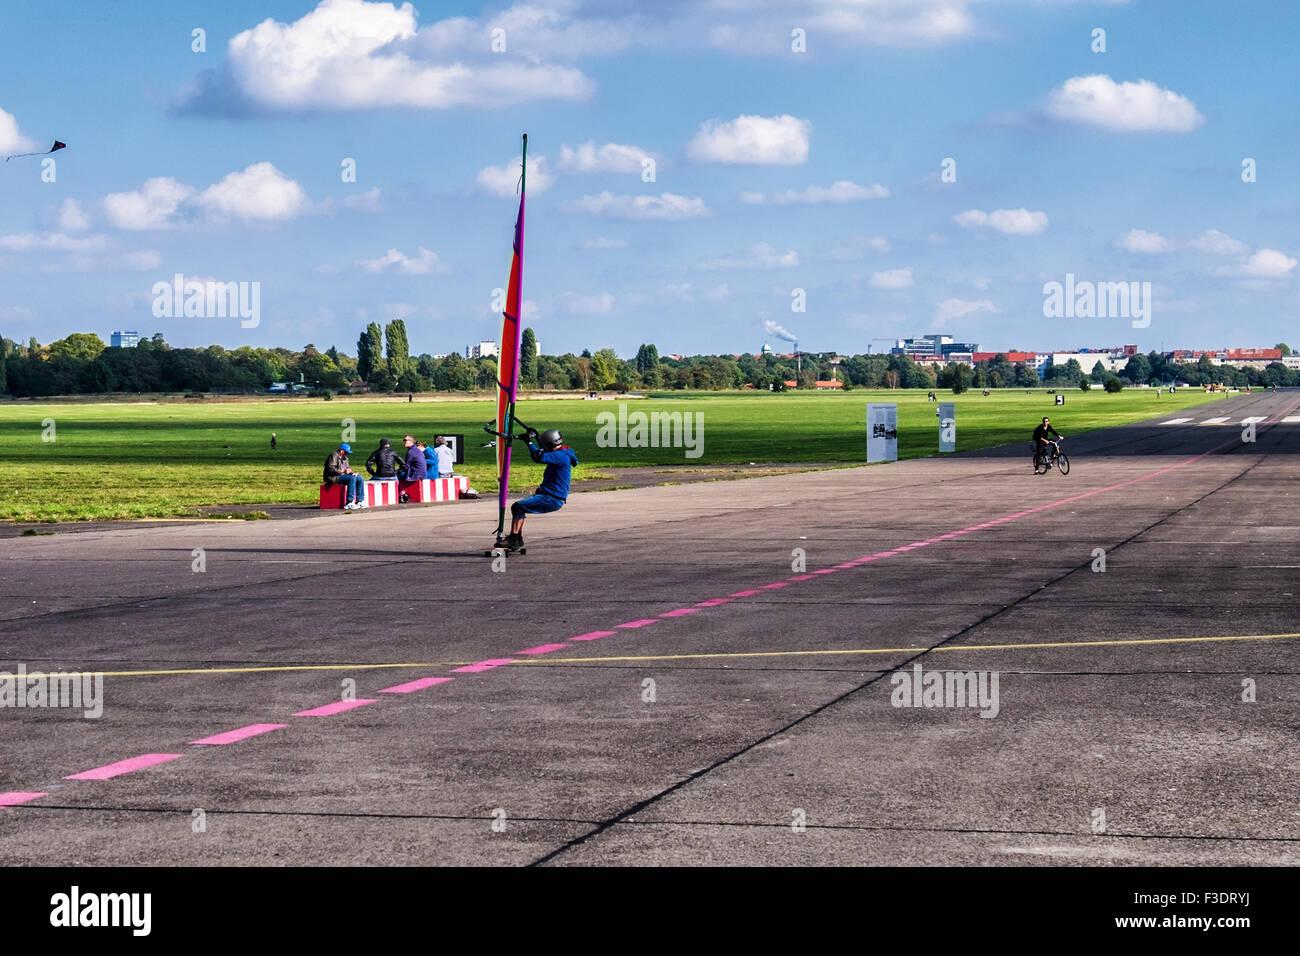 Berlin Tempelhof Airport, Flughafen. land sailing, terrasailing on old runway at Tempelhofer feld public park and - Stock Image